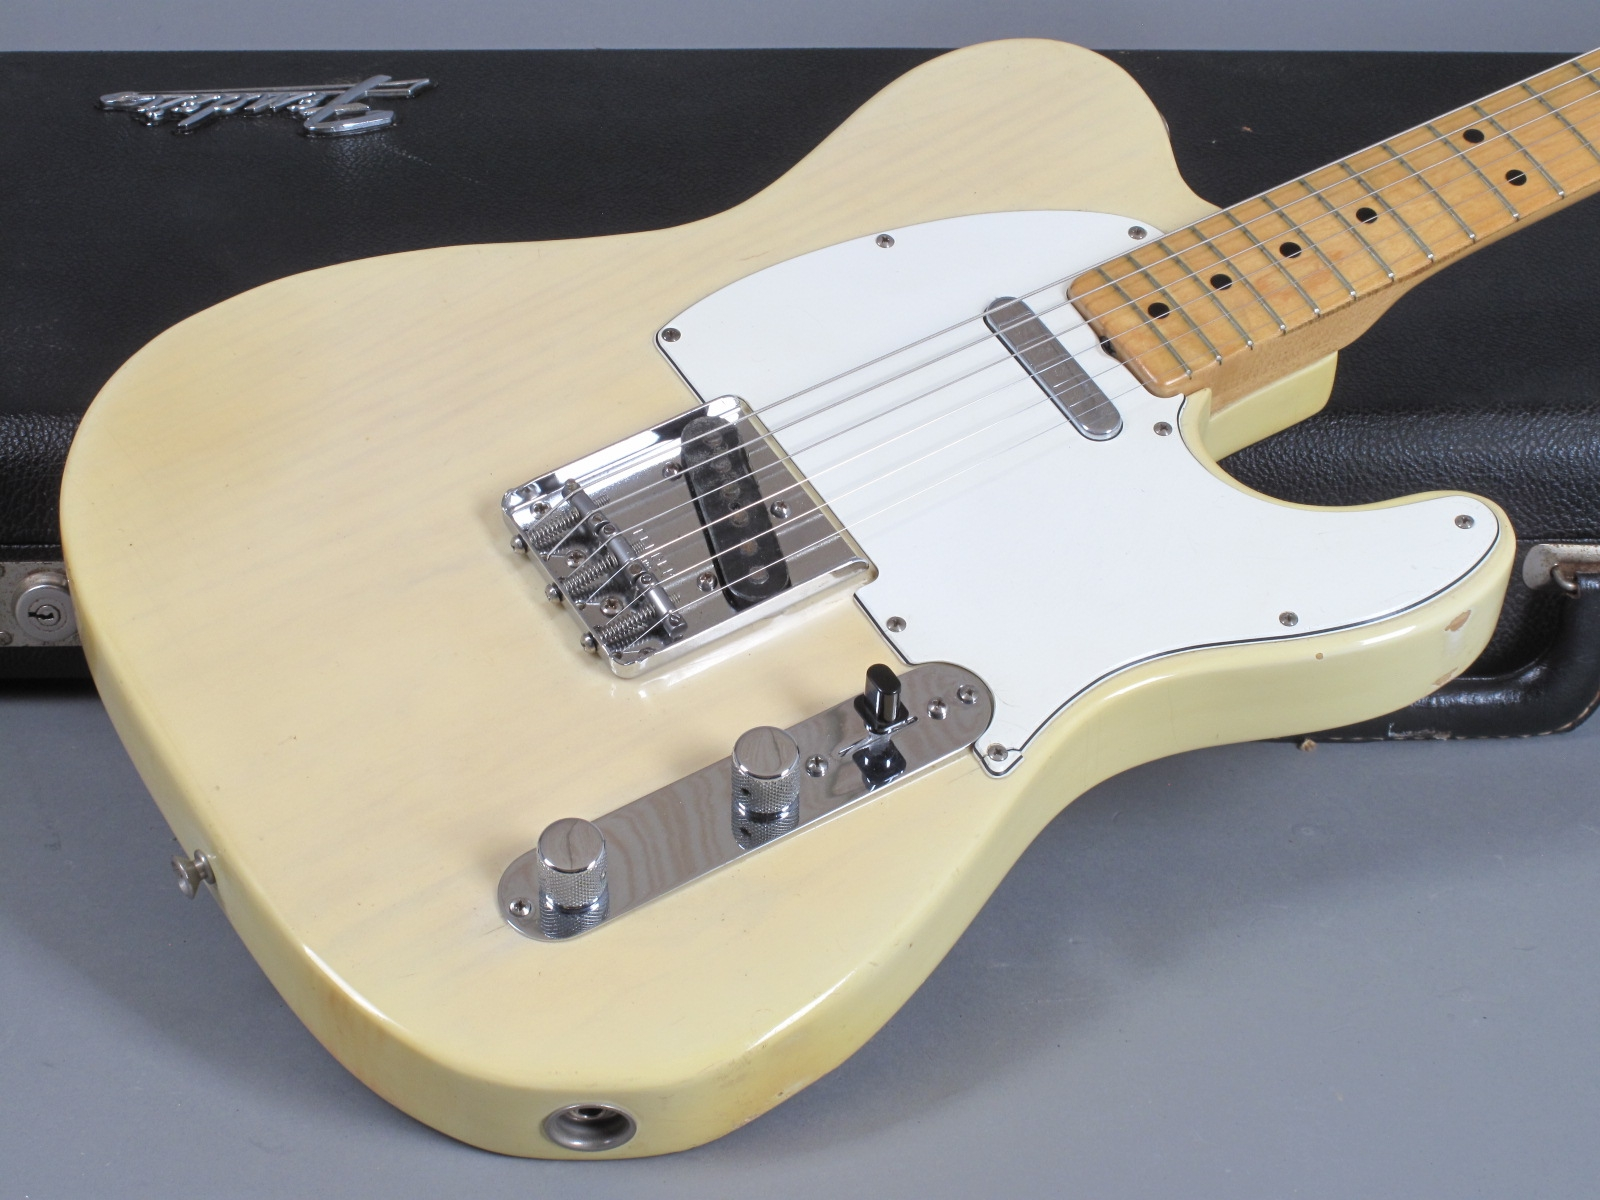 https://guitarpoint.de/app/uploads/products/1973-fender-telecaster-blond-super-clean/1973-Fender-Telecaster-Blond-377899_17.jpg